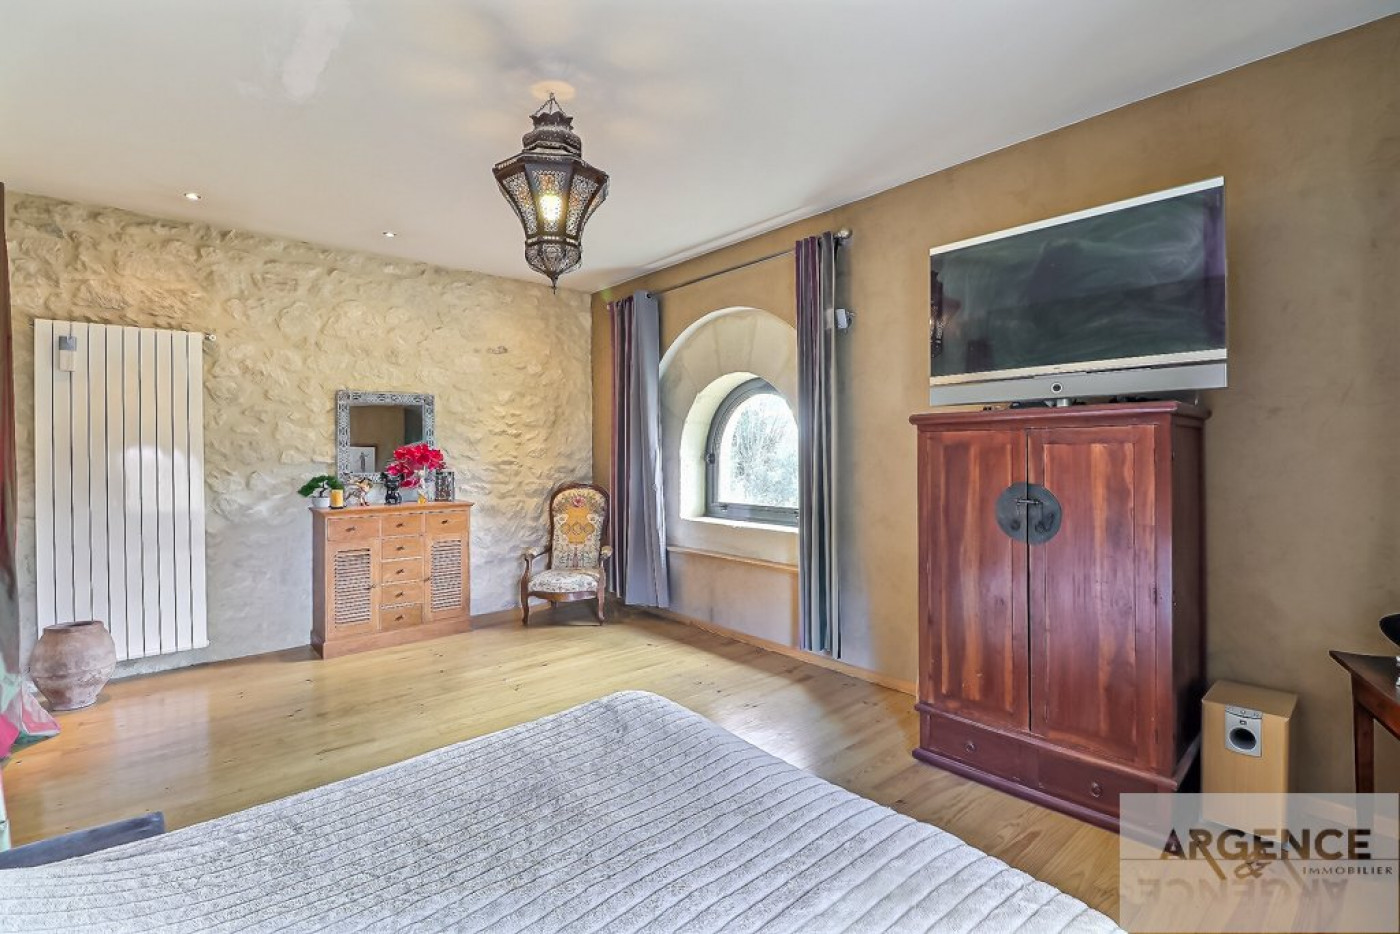 A vendre  Sommieres | Réf 345335722 - Argence immobilier